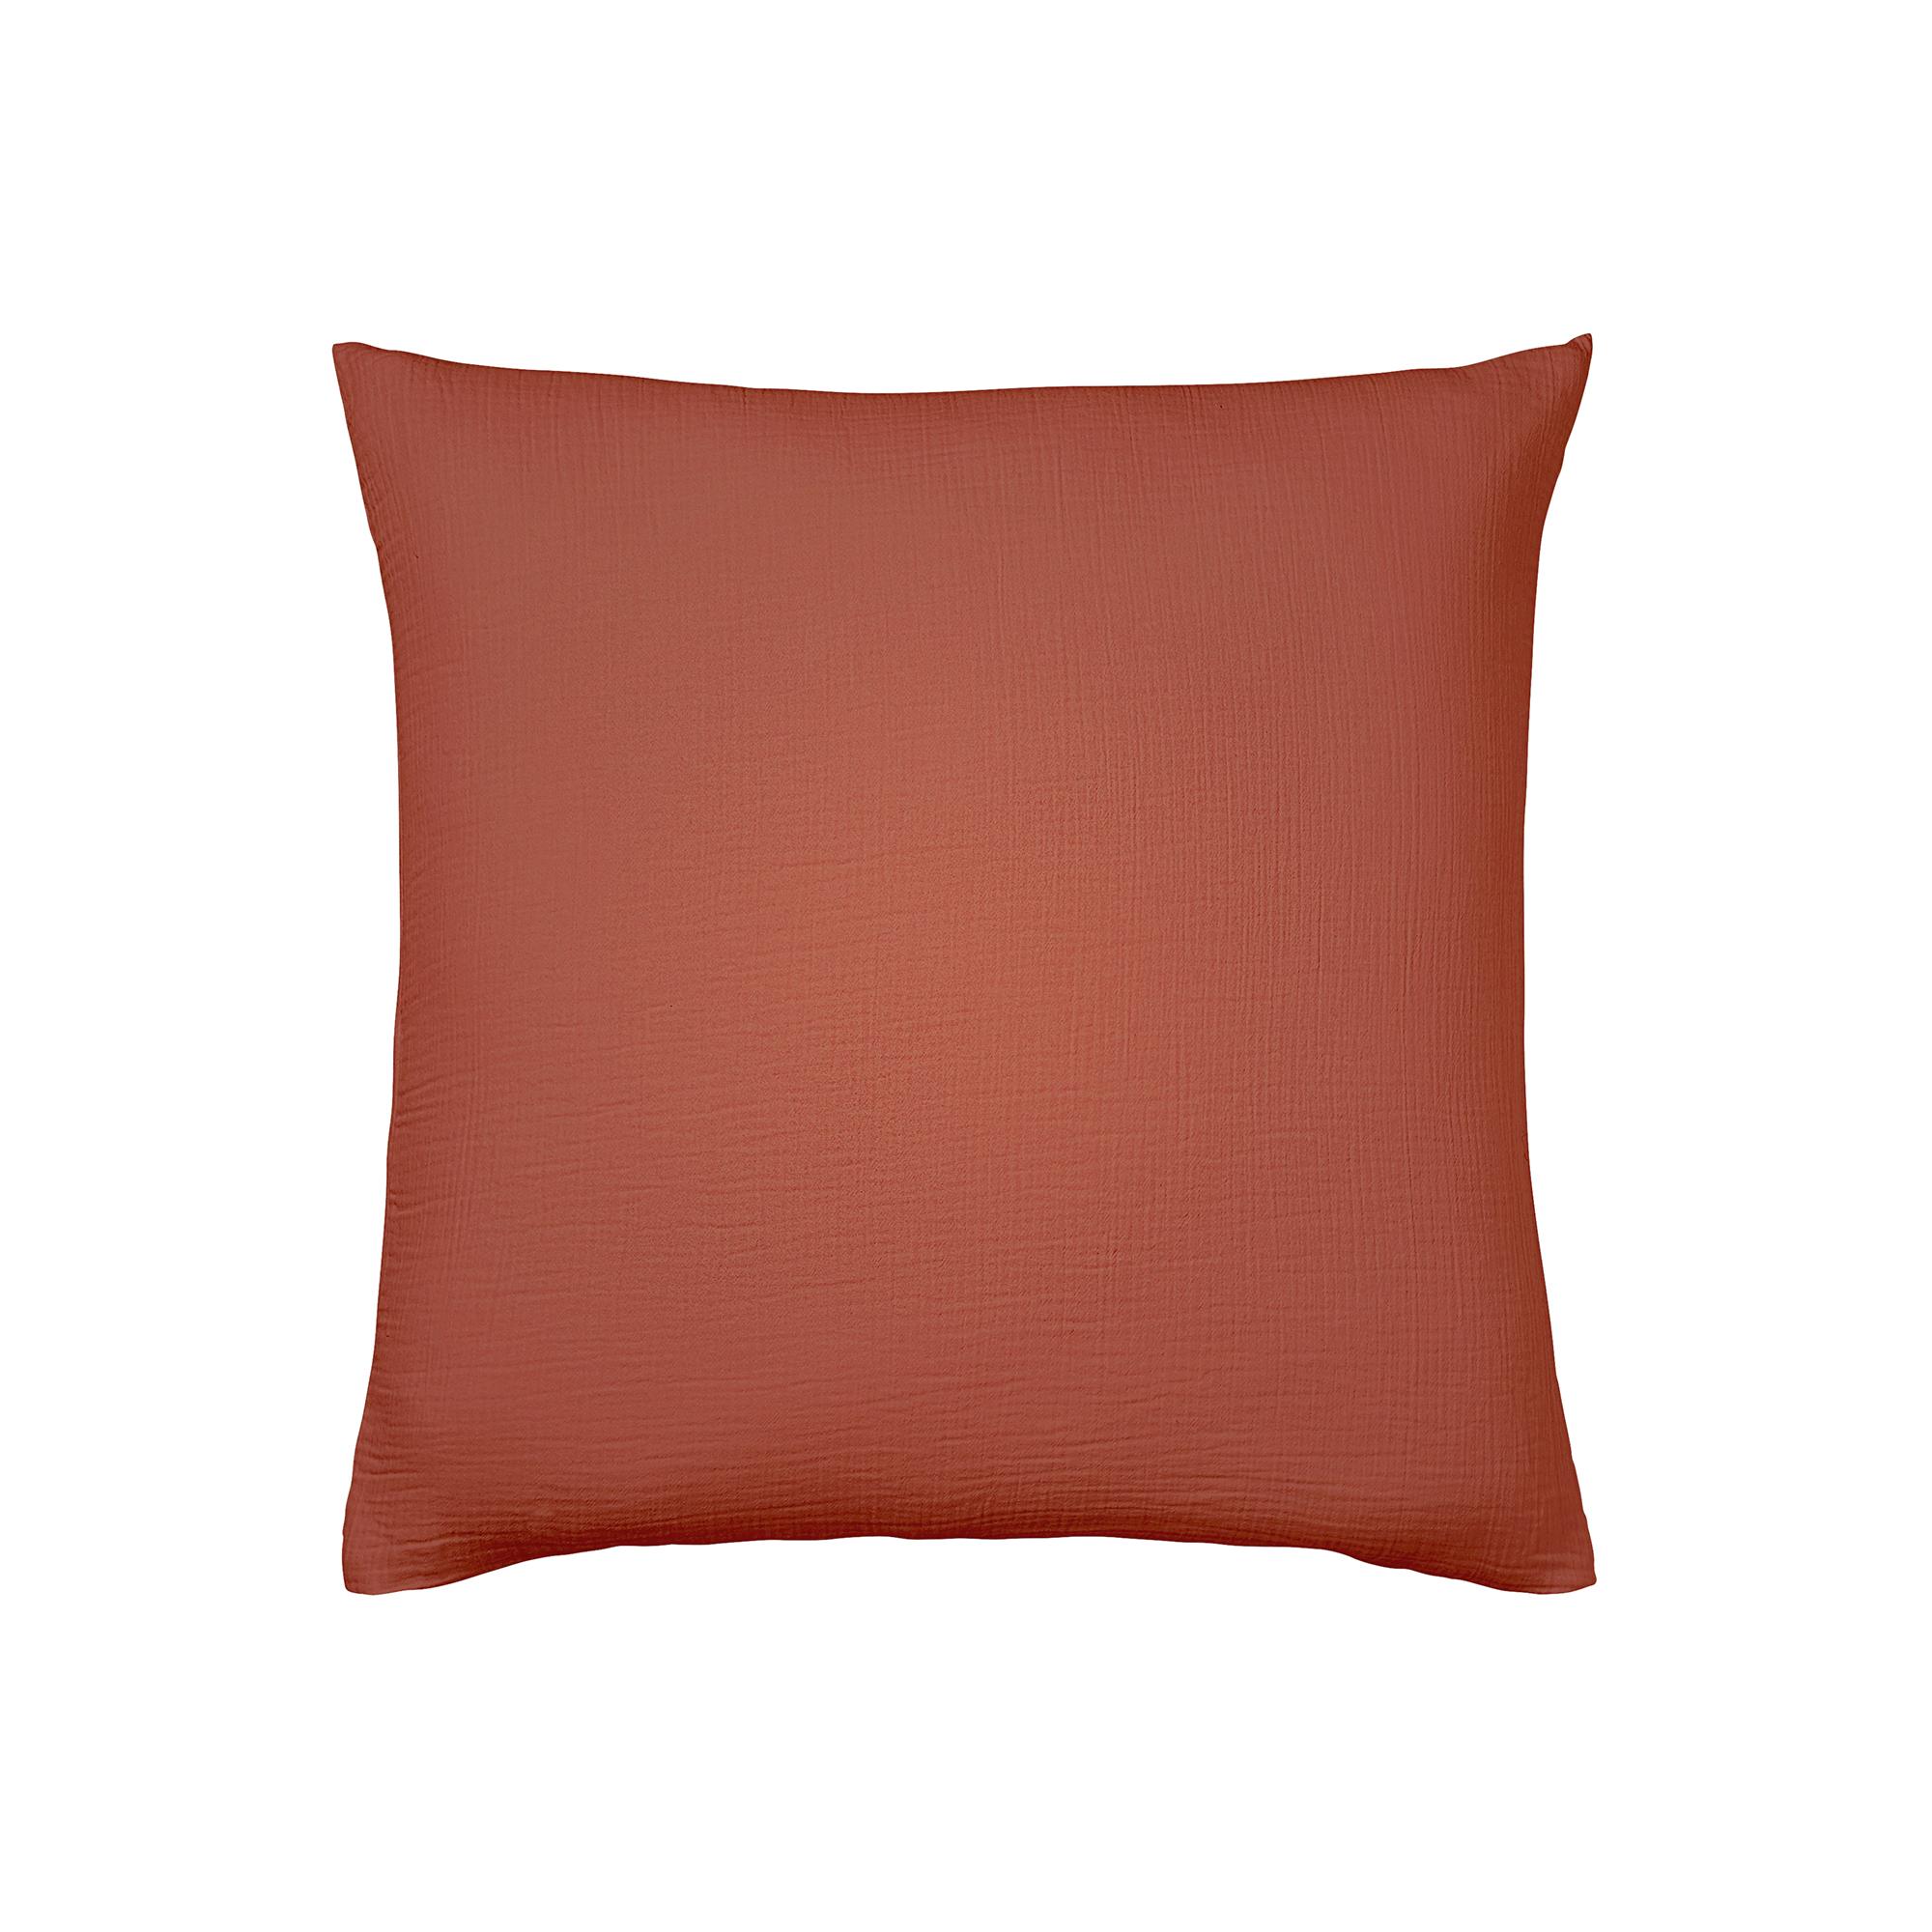 Taie d'oreiller en coton orange 65x65